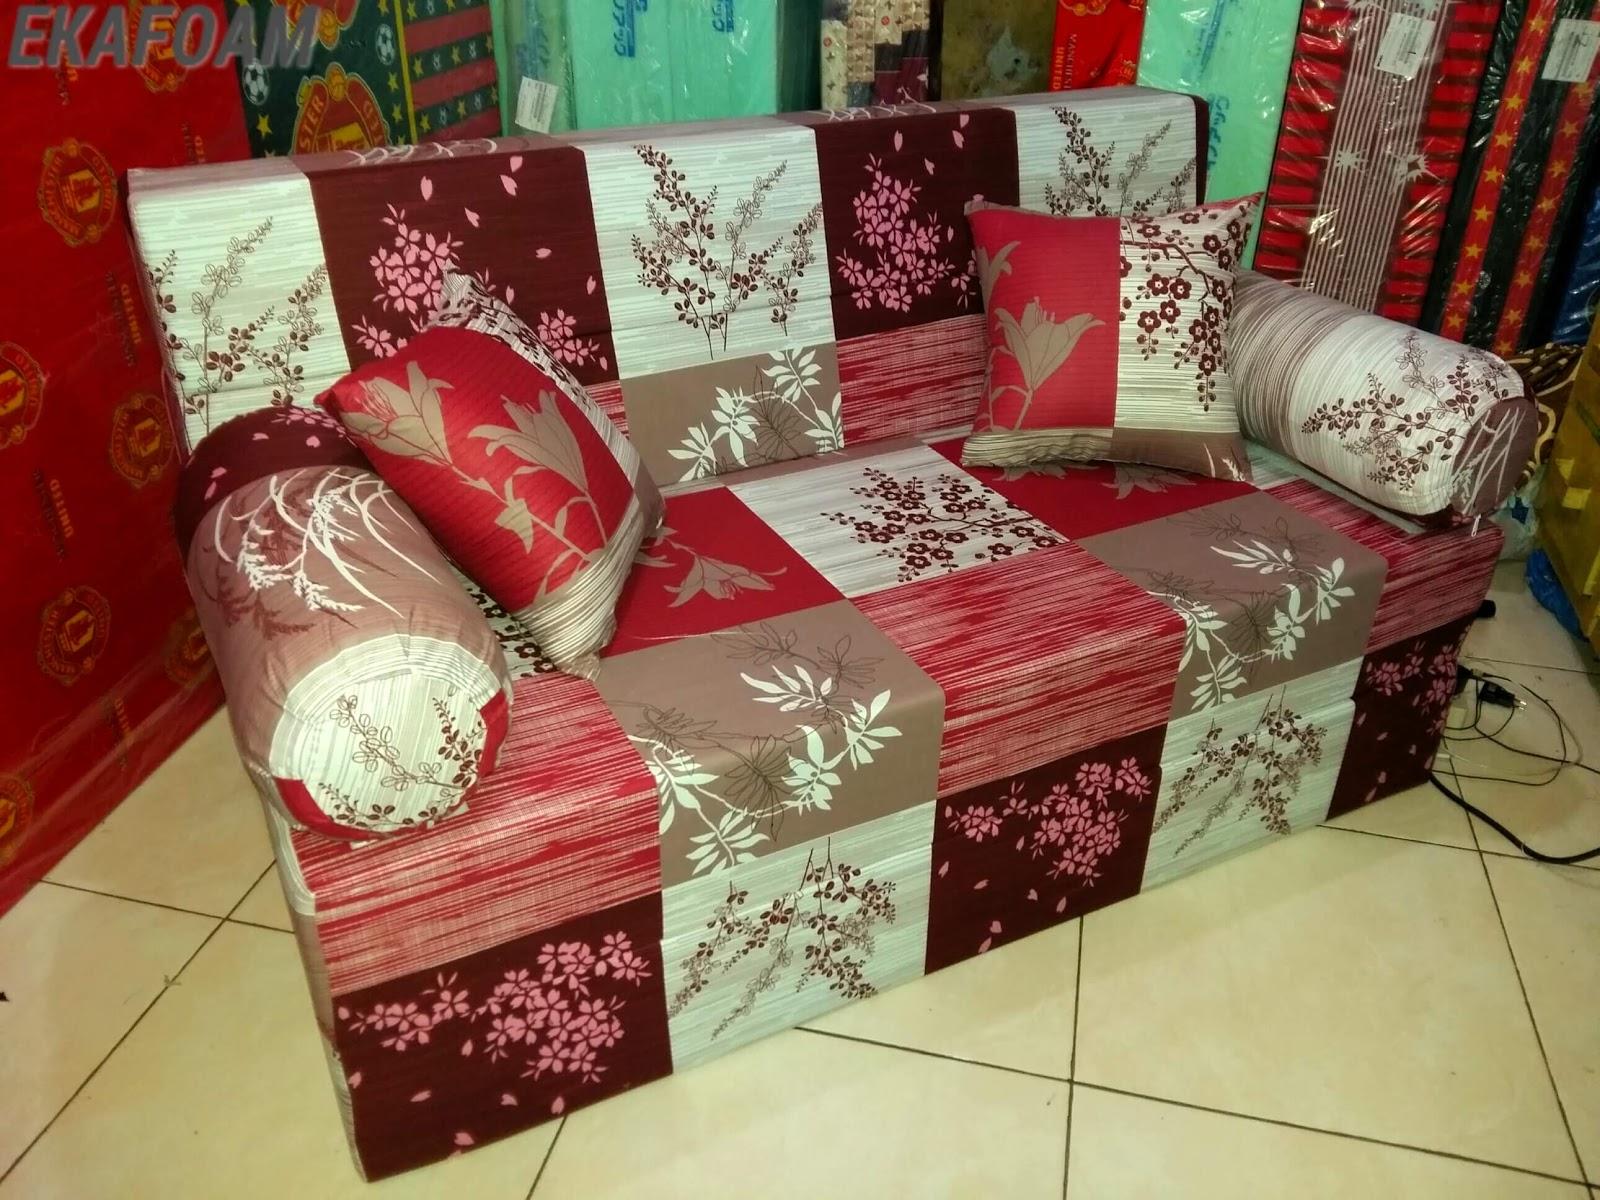 Harga Sofa Bed Inoac Terbaru 2018 Agen Jual Kasur Busa Inoac